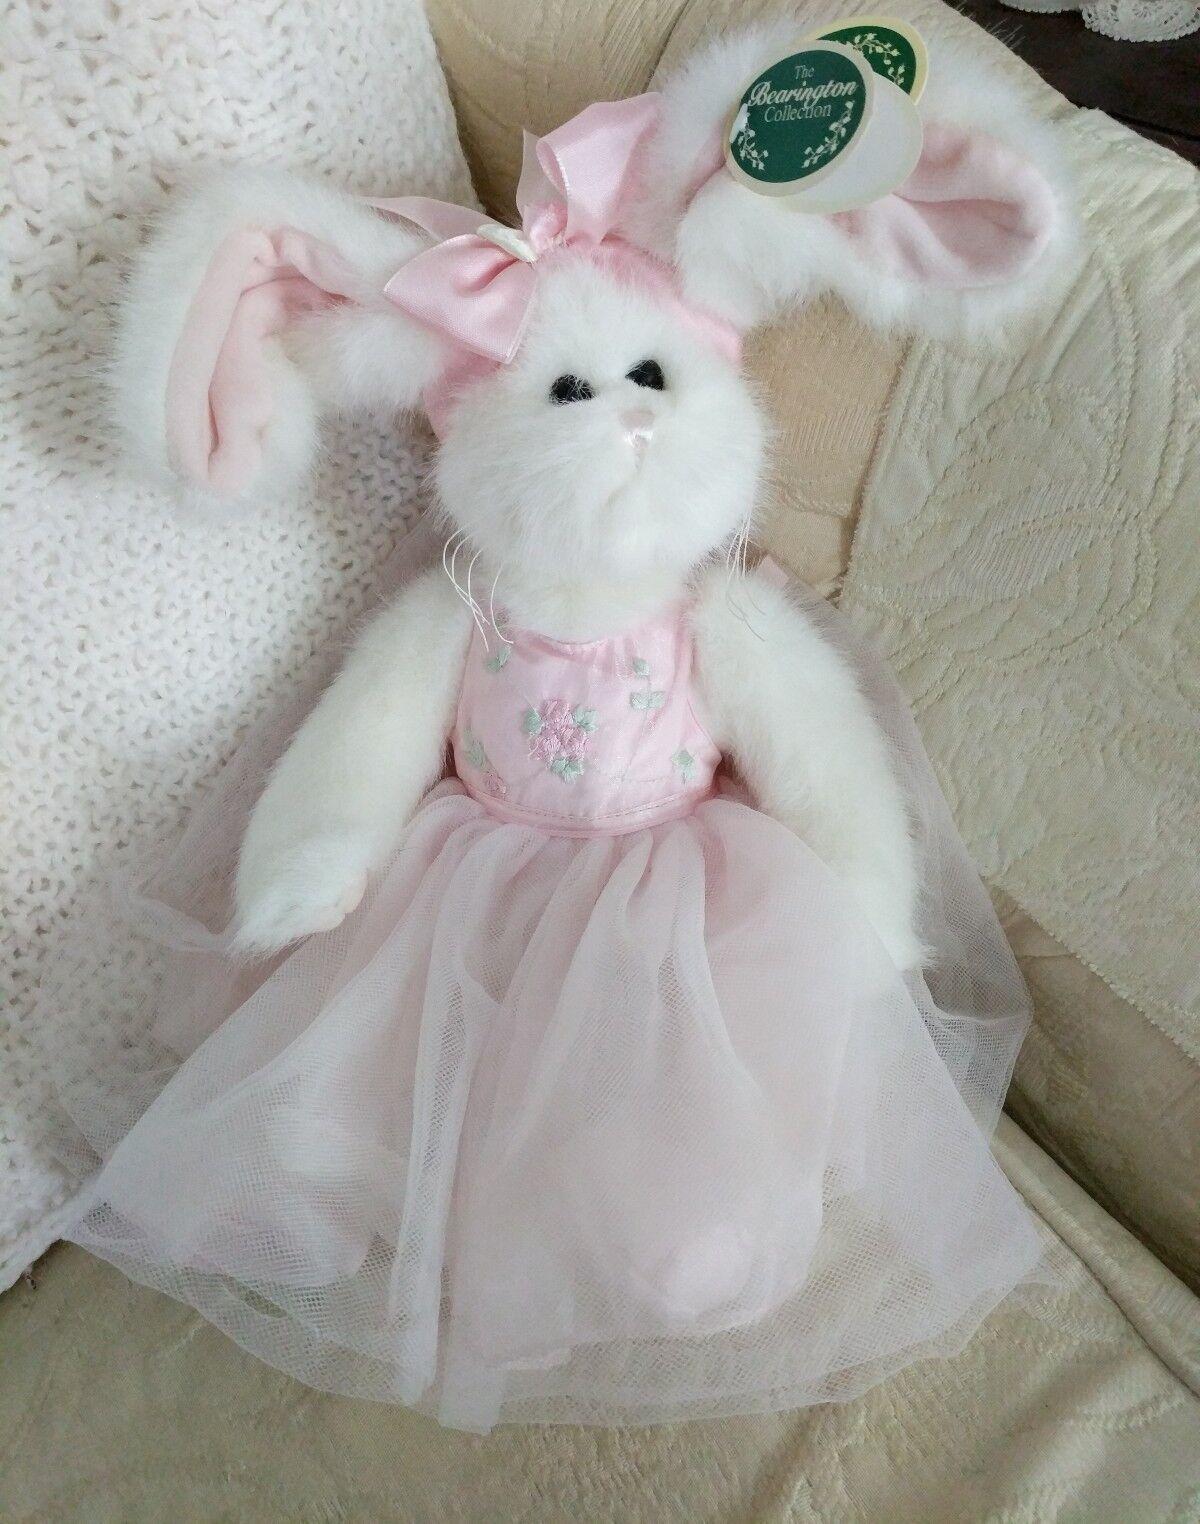 Bearington Collection Bears Tippy Toes bianca Bunny Rabbit Ballerina Tags Easter